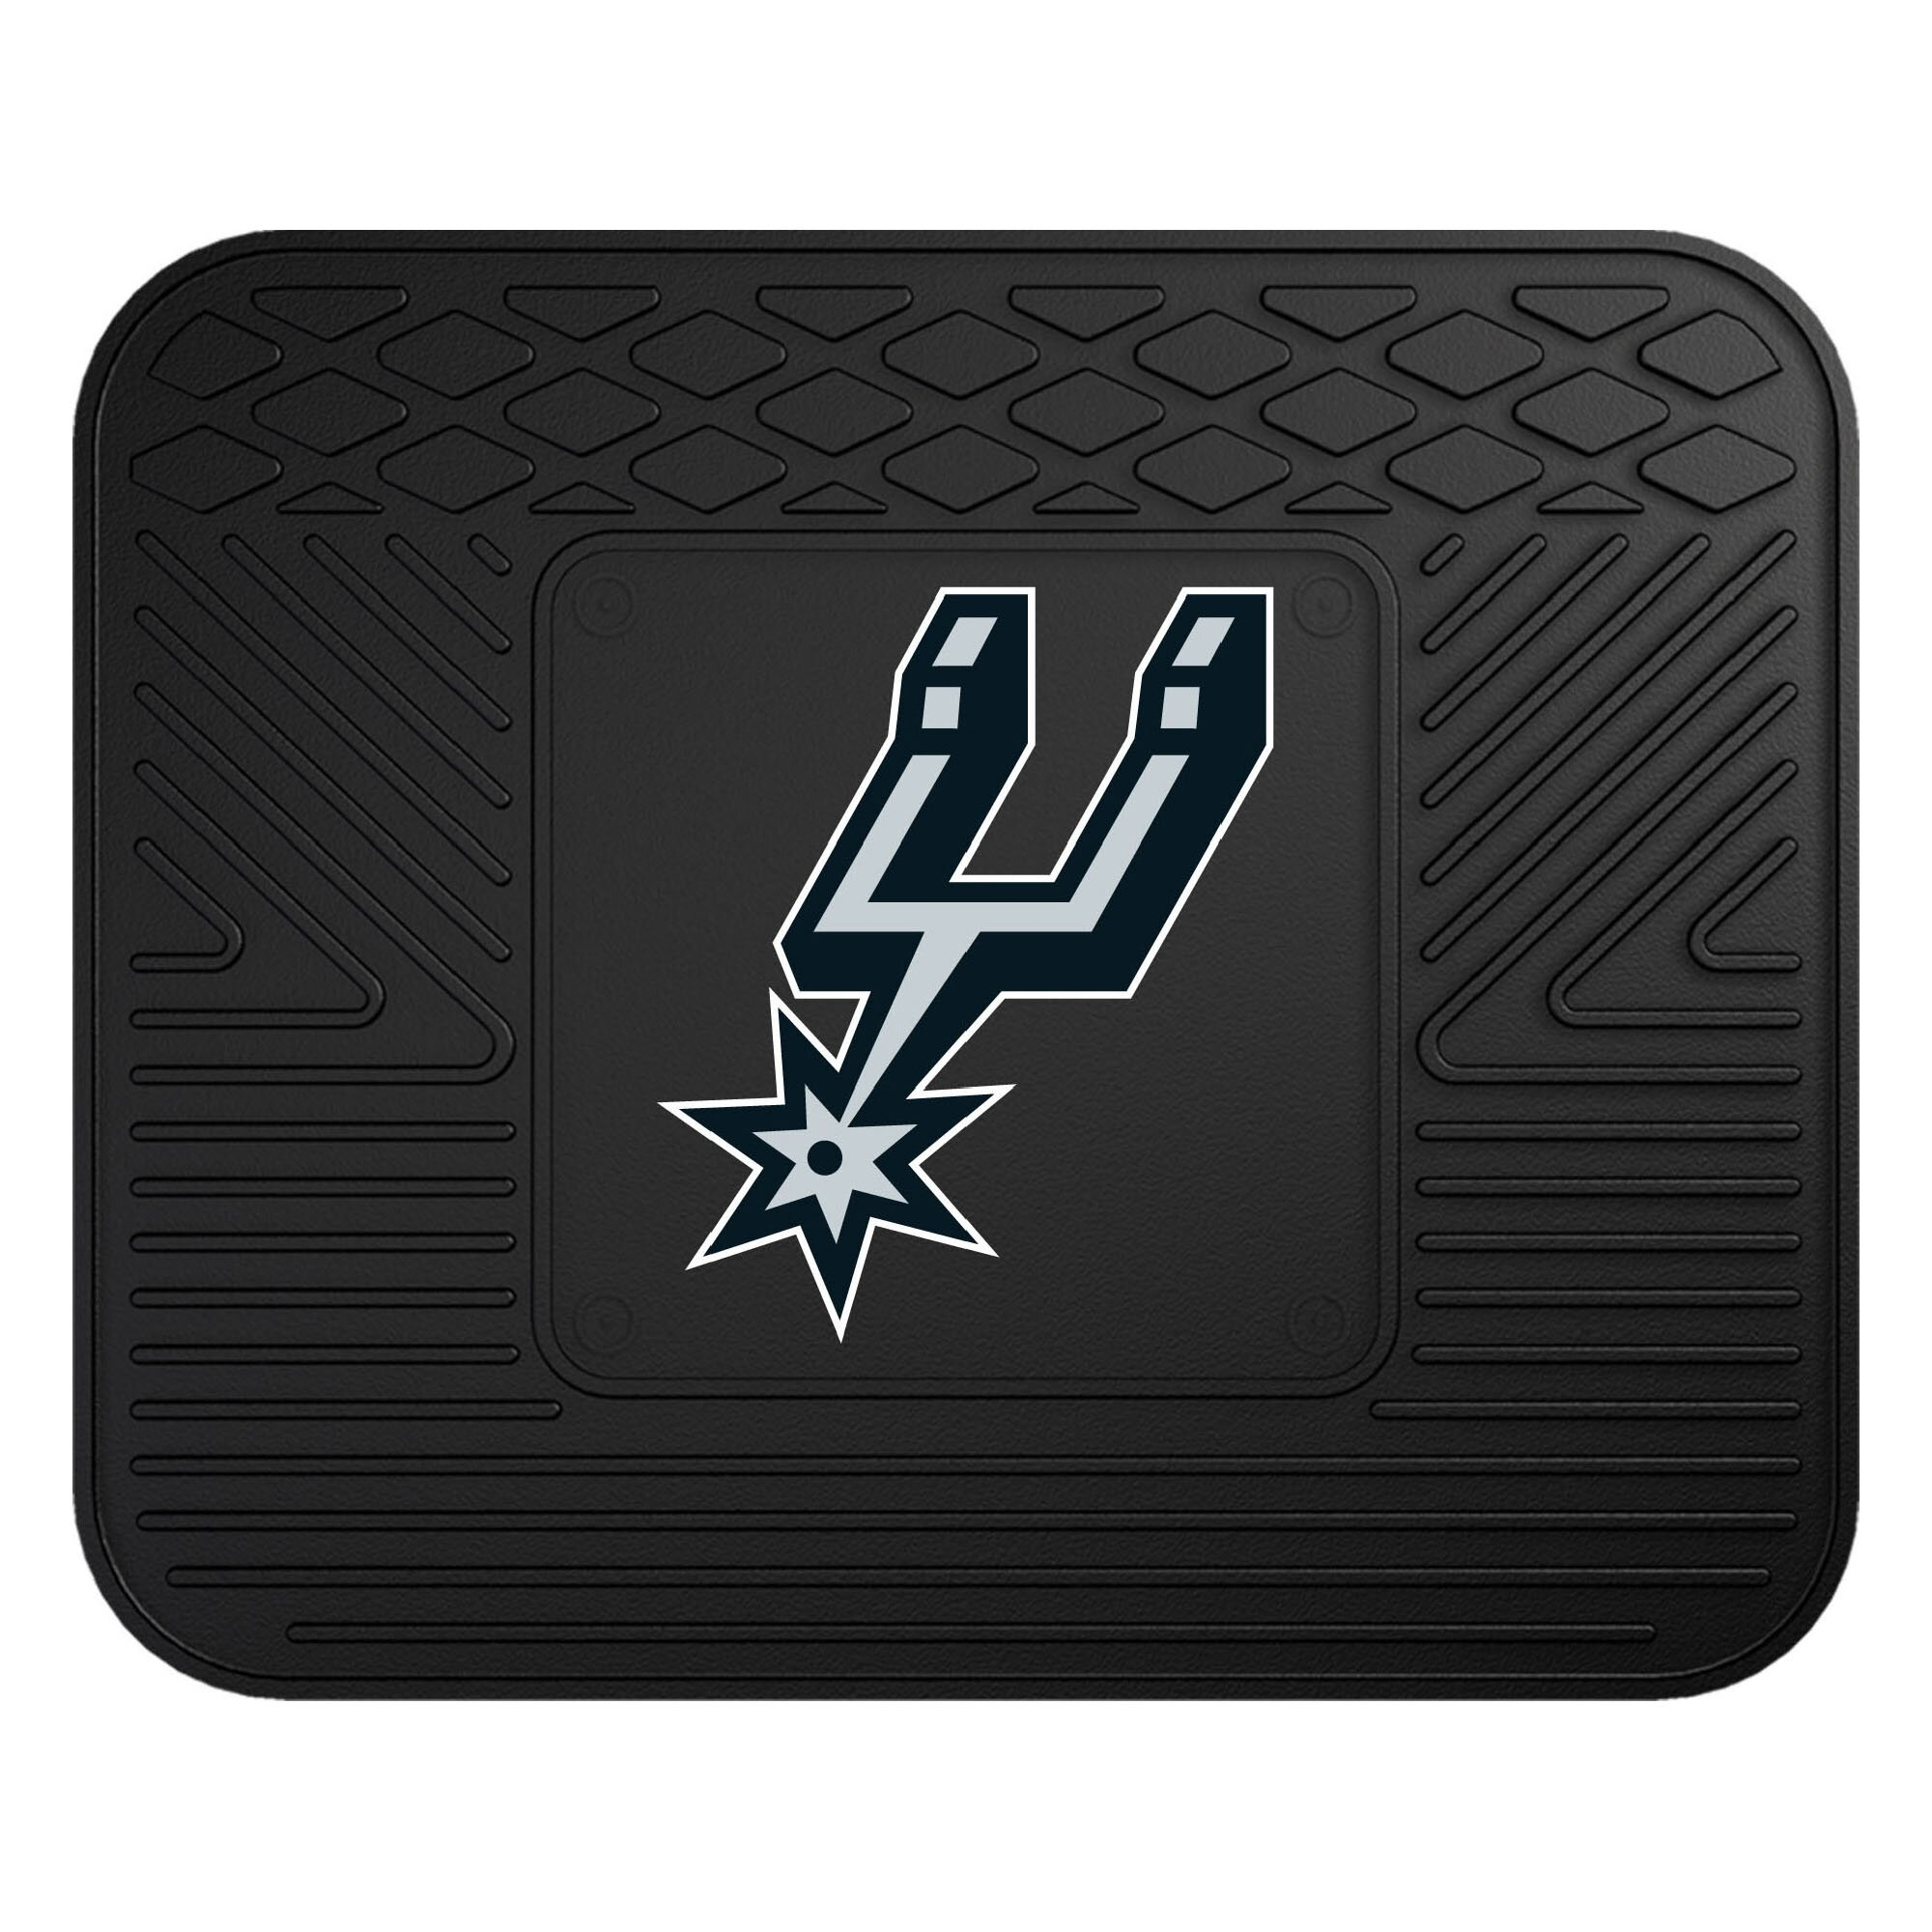 Najarian Nba Youth Bedroom In A Box: FANMATS NBA San Antonio Spurs Utility Mat